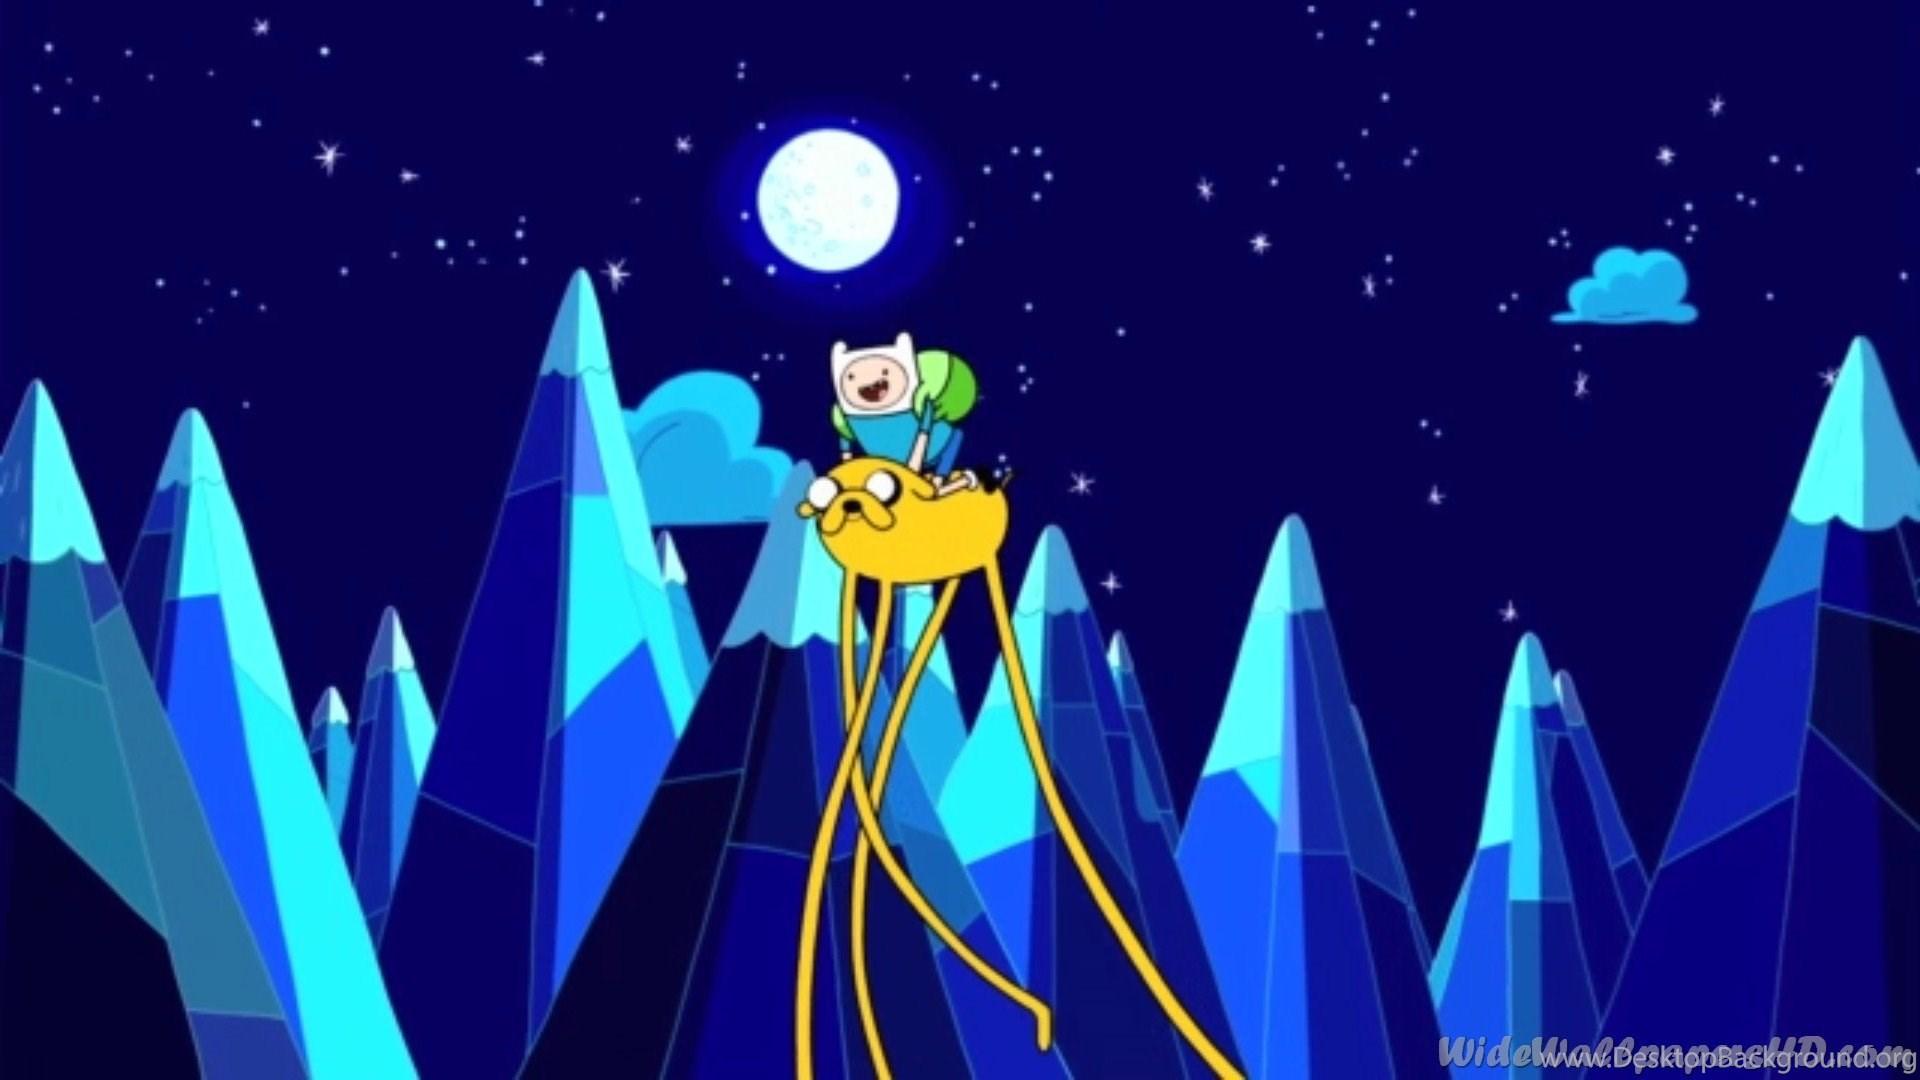 High Resolution Cute Adventure Time Finn And Jake